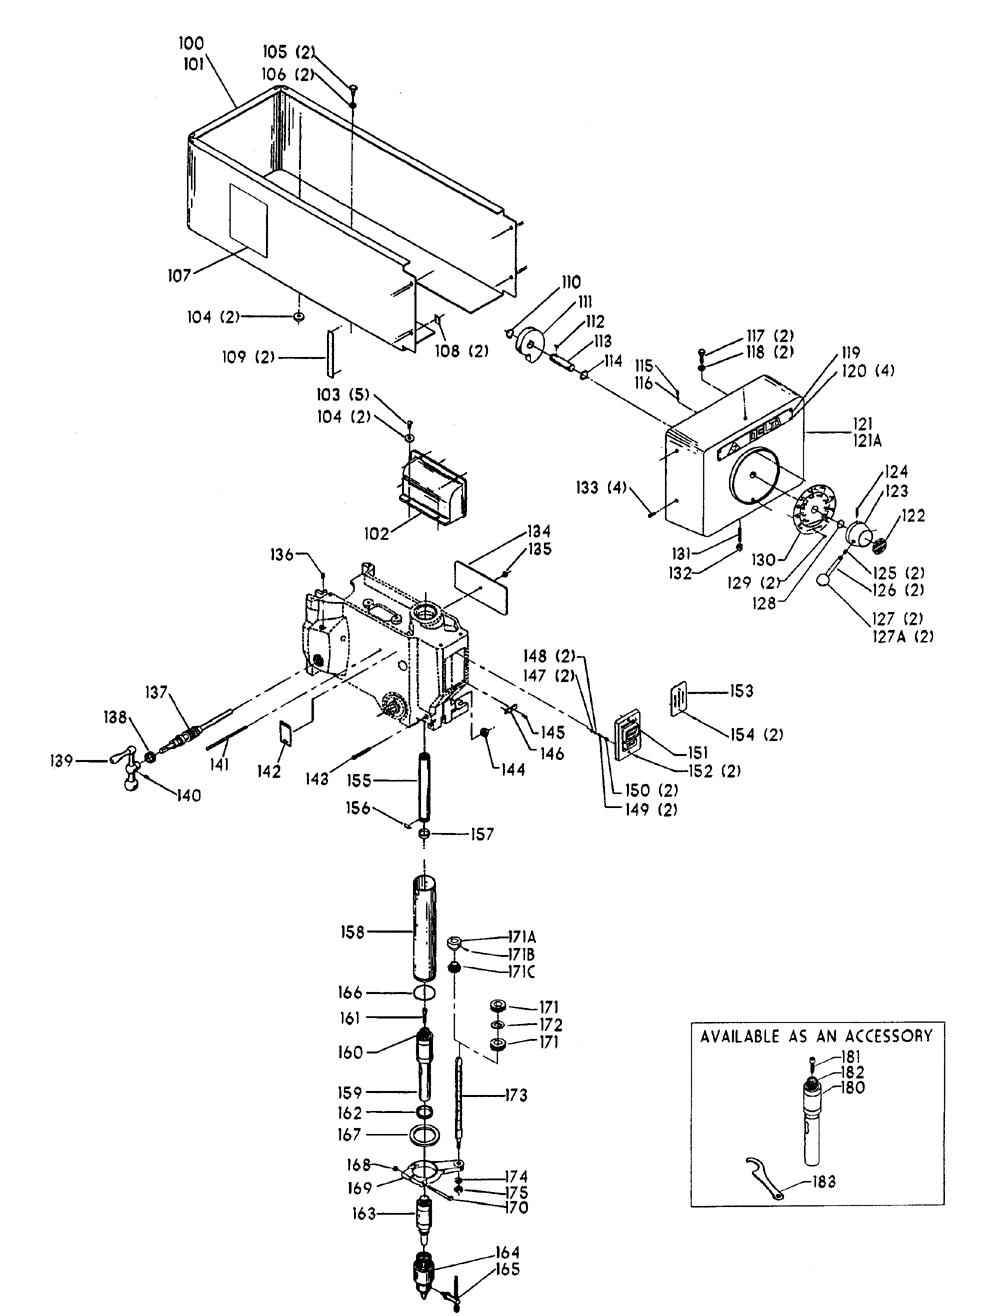 Delta-17-531-Type-1-Parts-3628-PBBreak Down